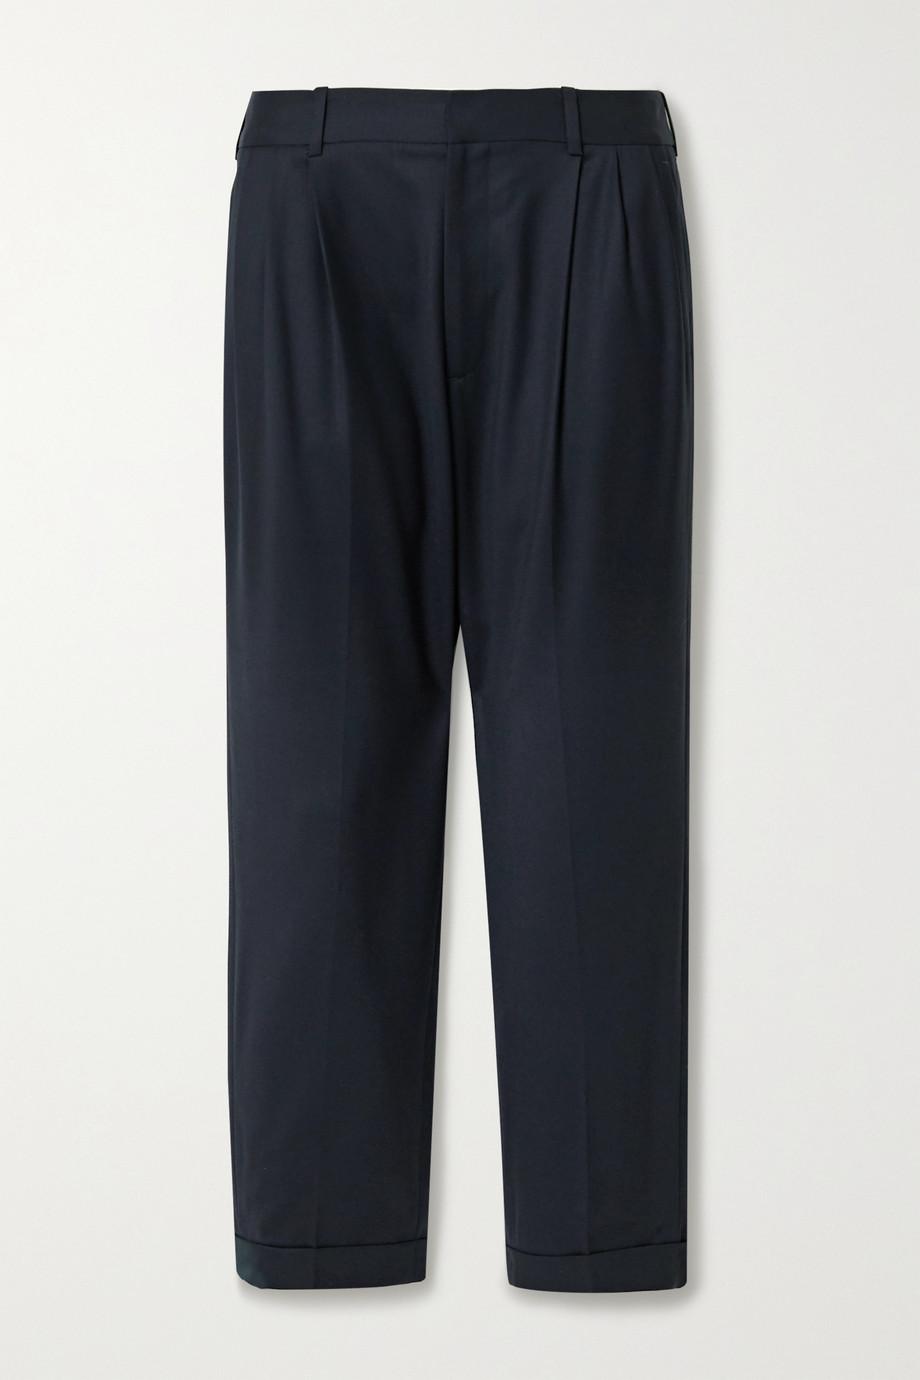 Nili Lotan Montana pleated wool-blend twill tapered pants